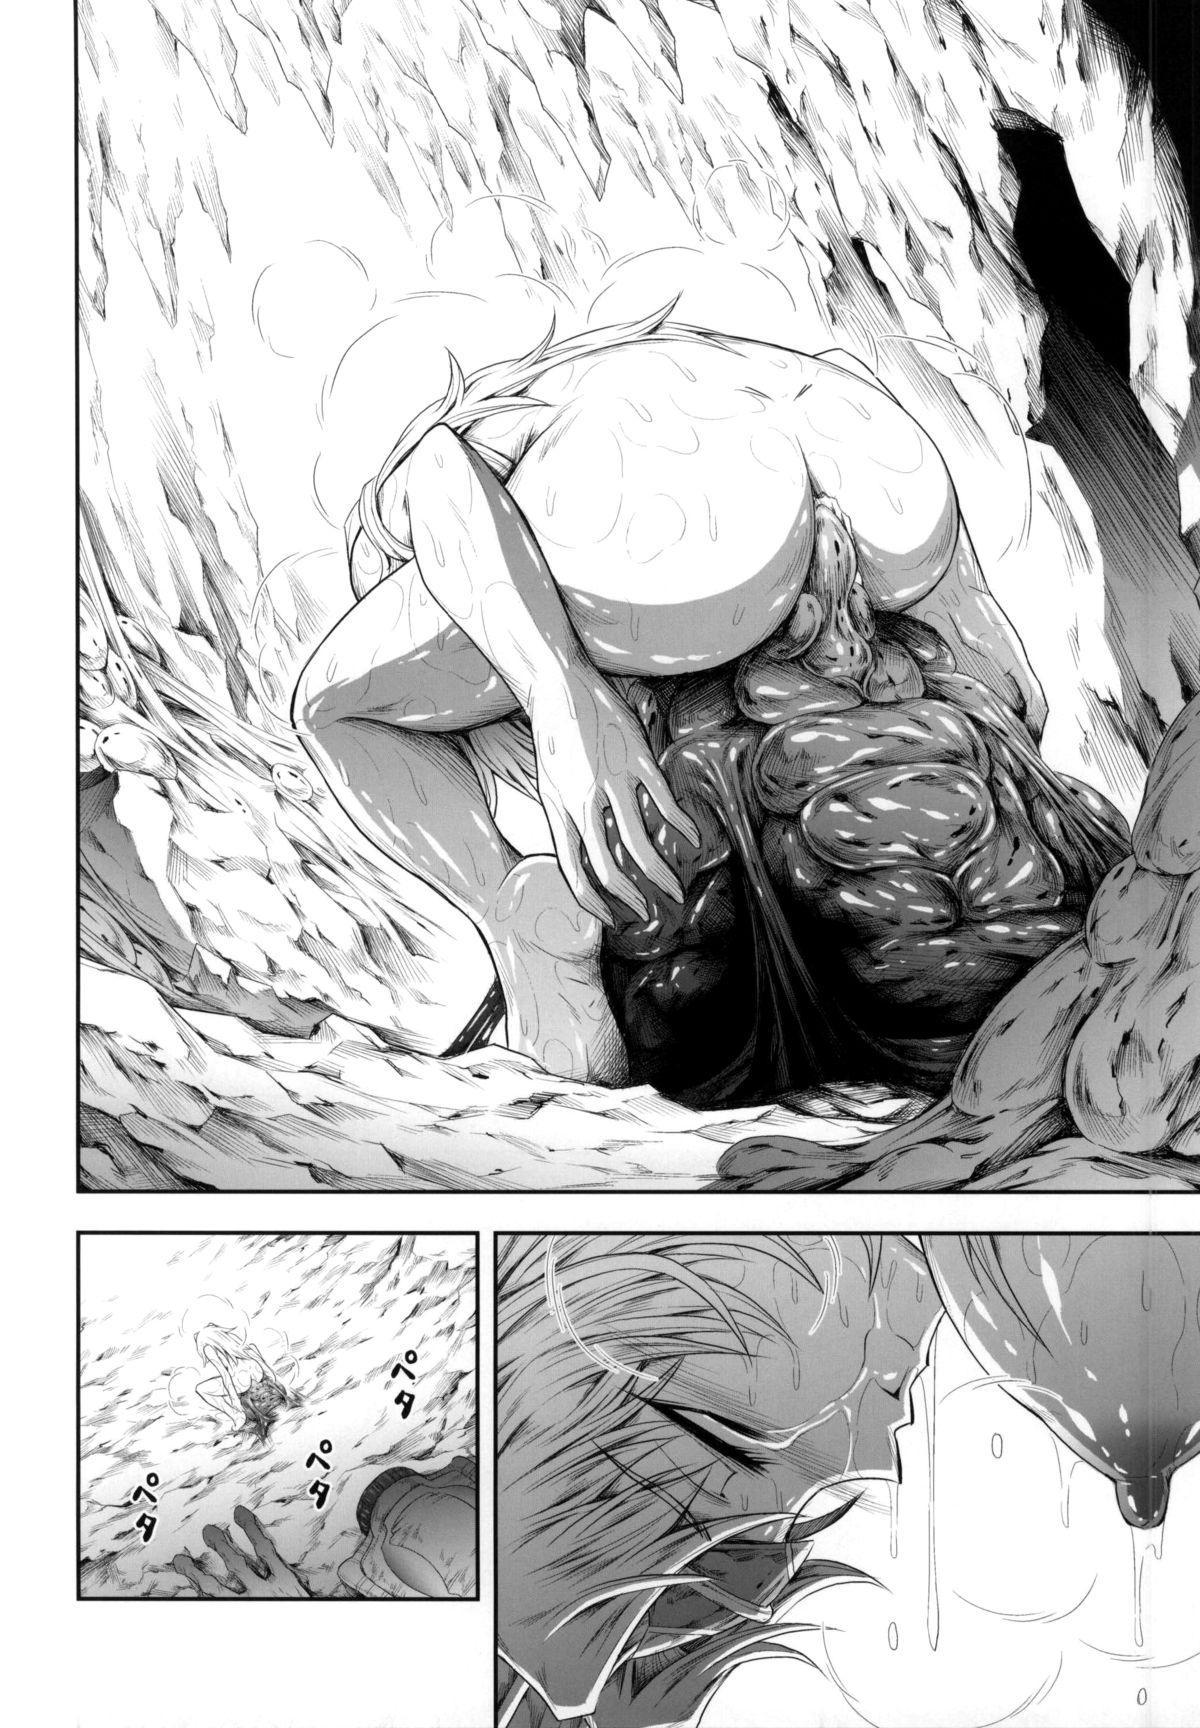 Solo Hunter no Seitai 4 The third part 31